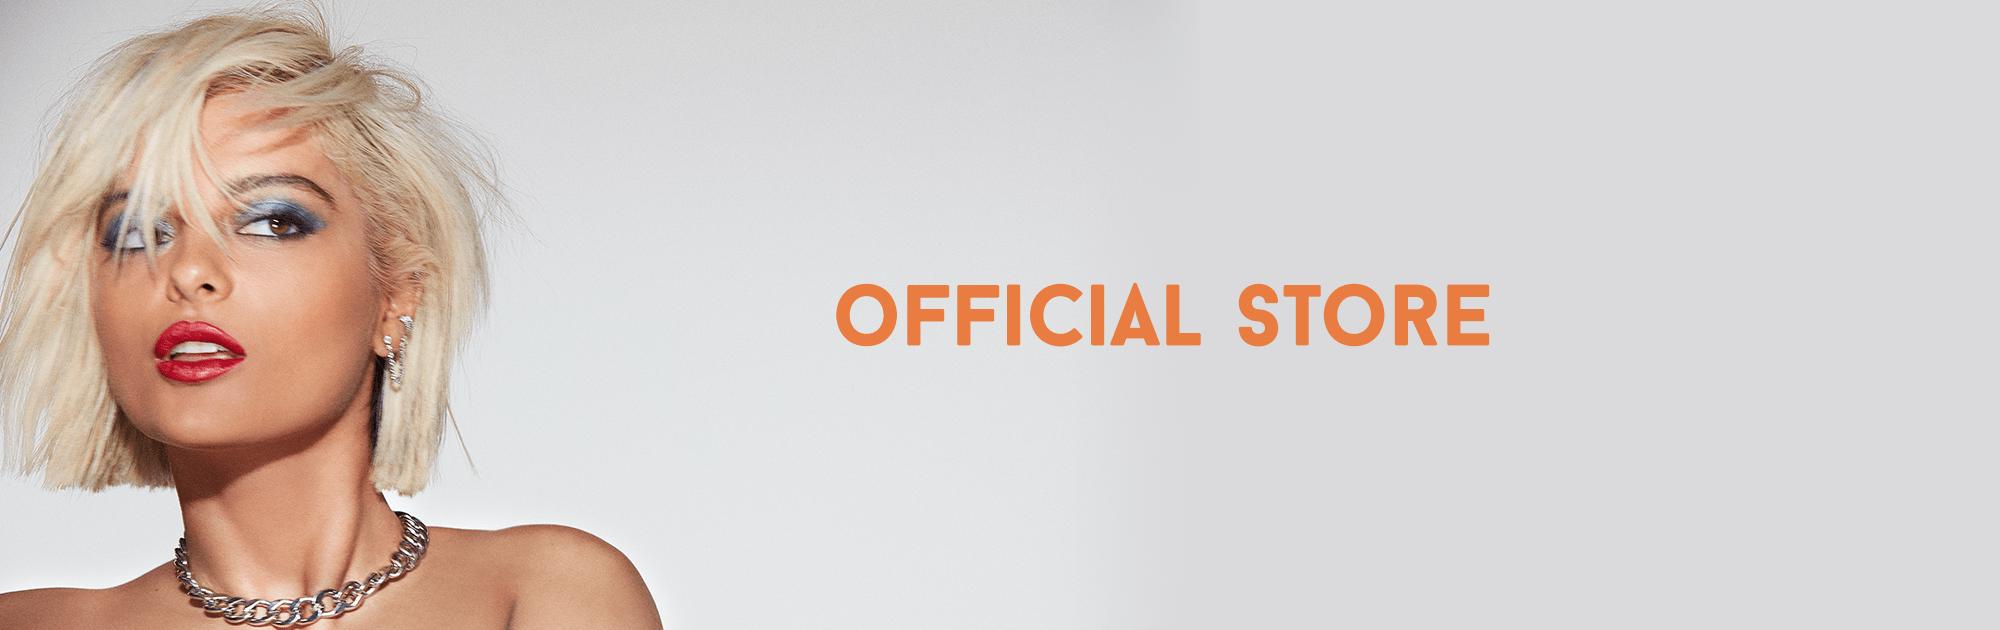 bebe rexha official store